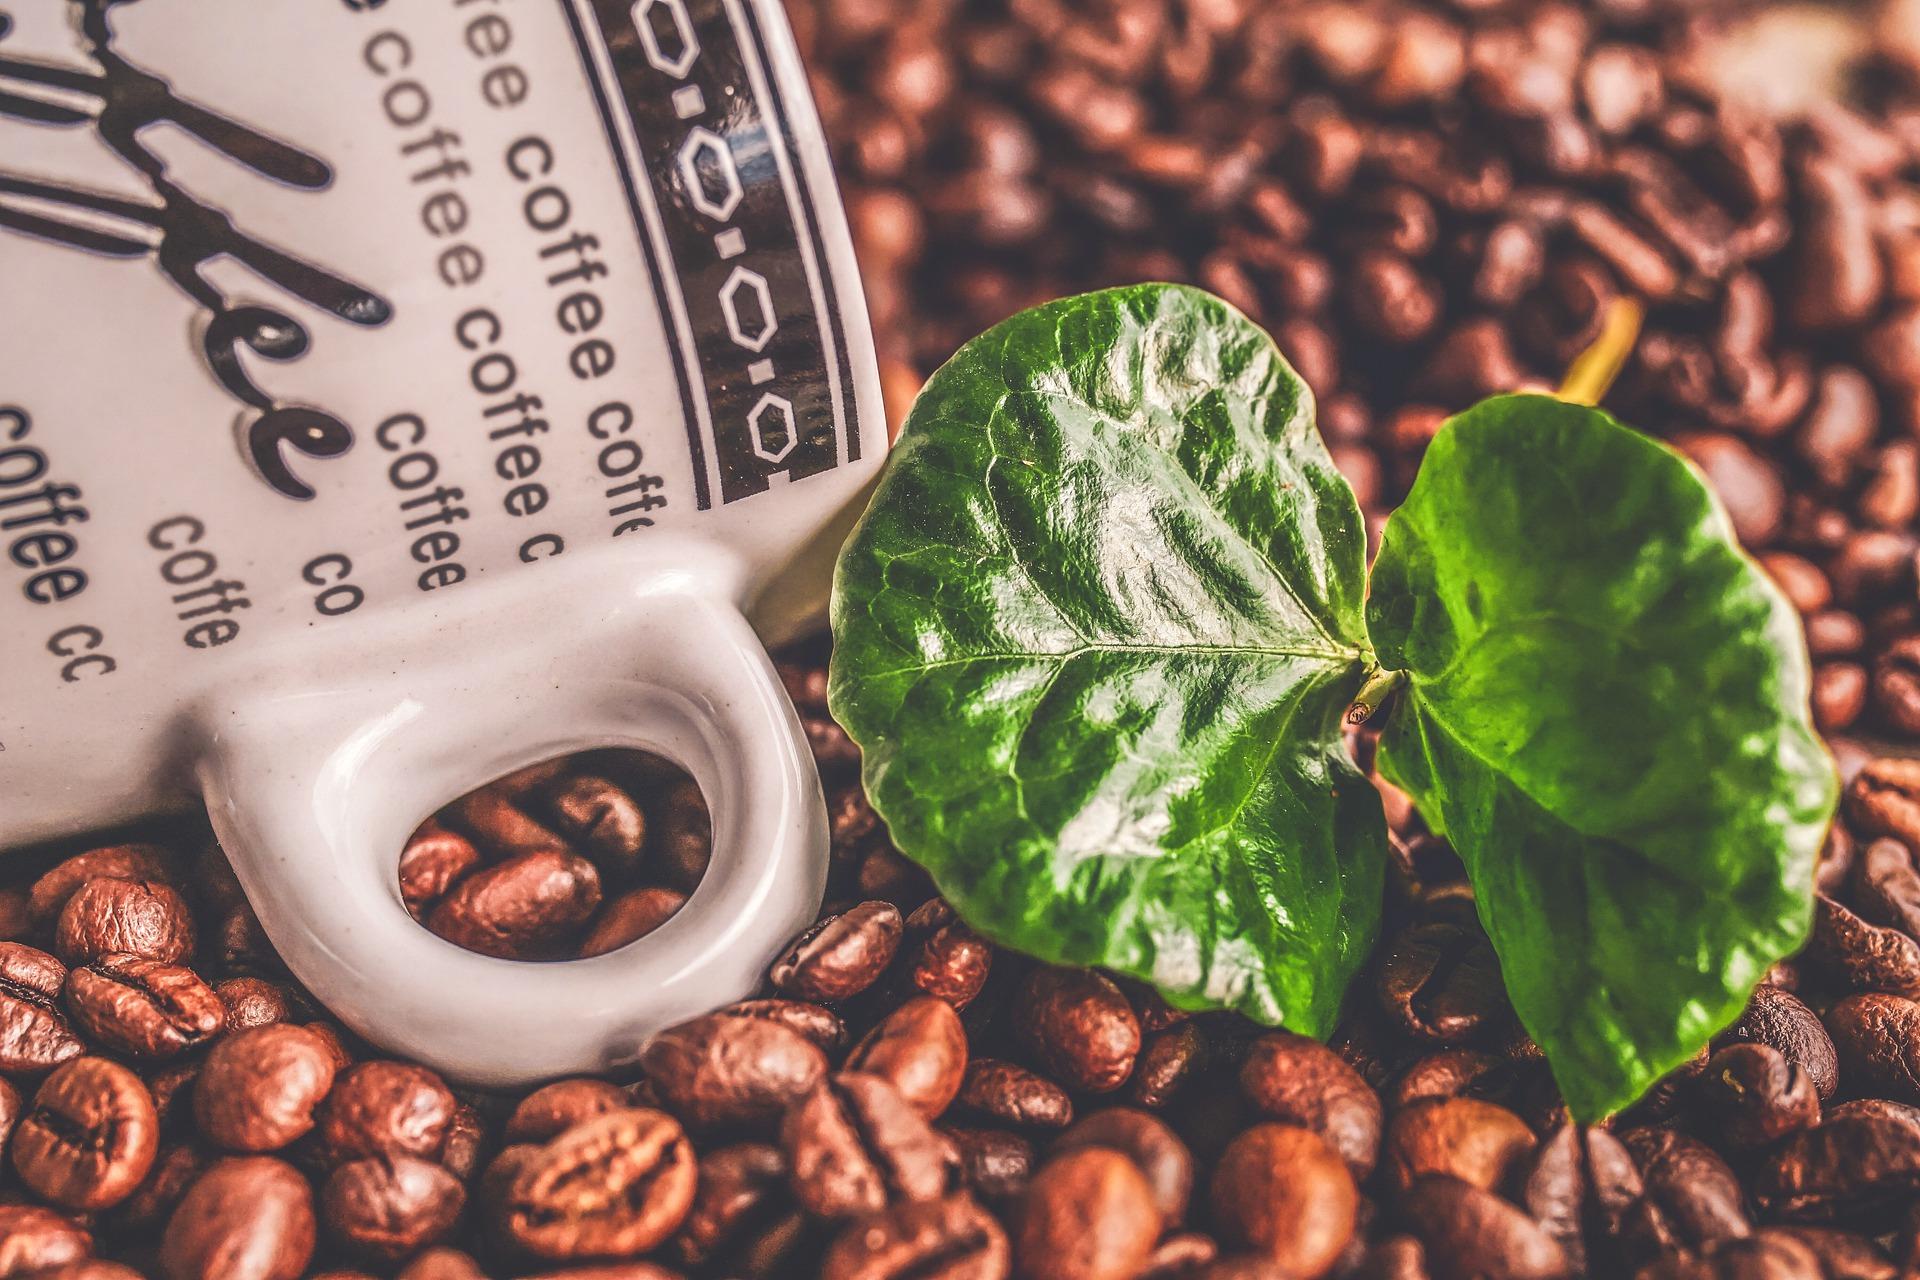 pianta-del-caffè-costiera-caffè-design-arabica-robusta-caffè